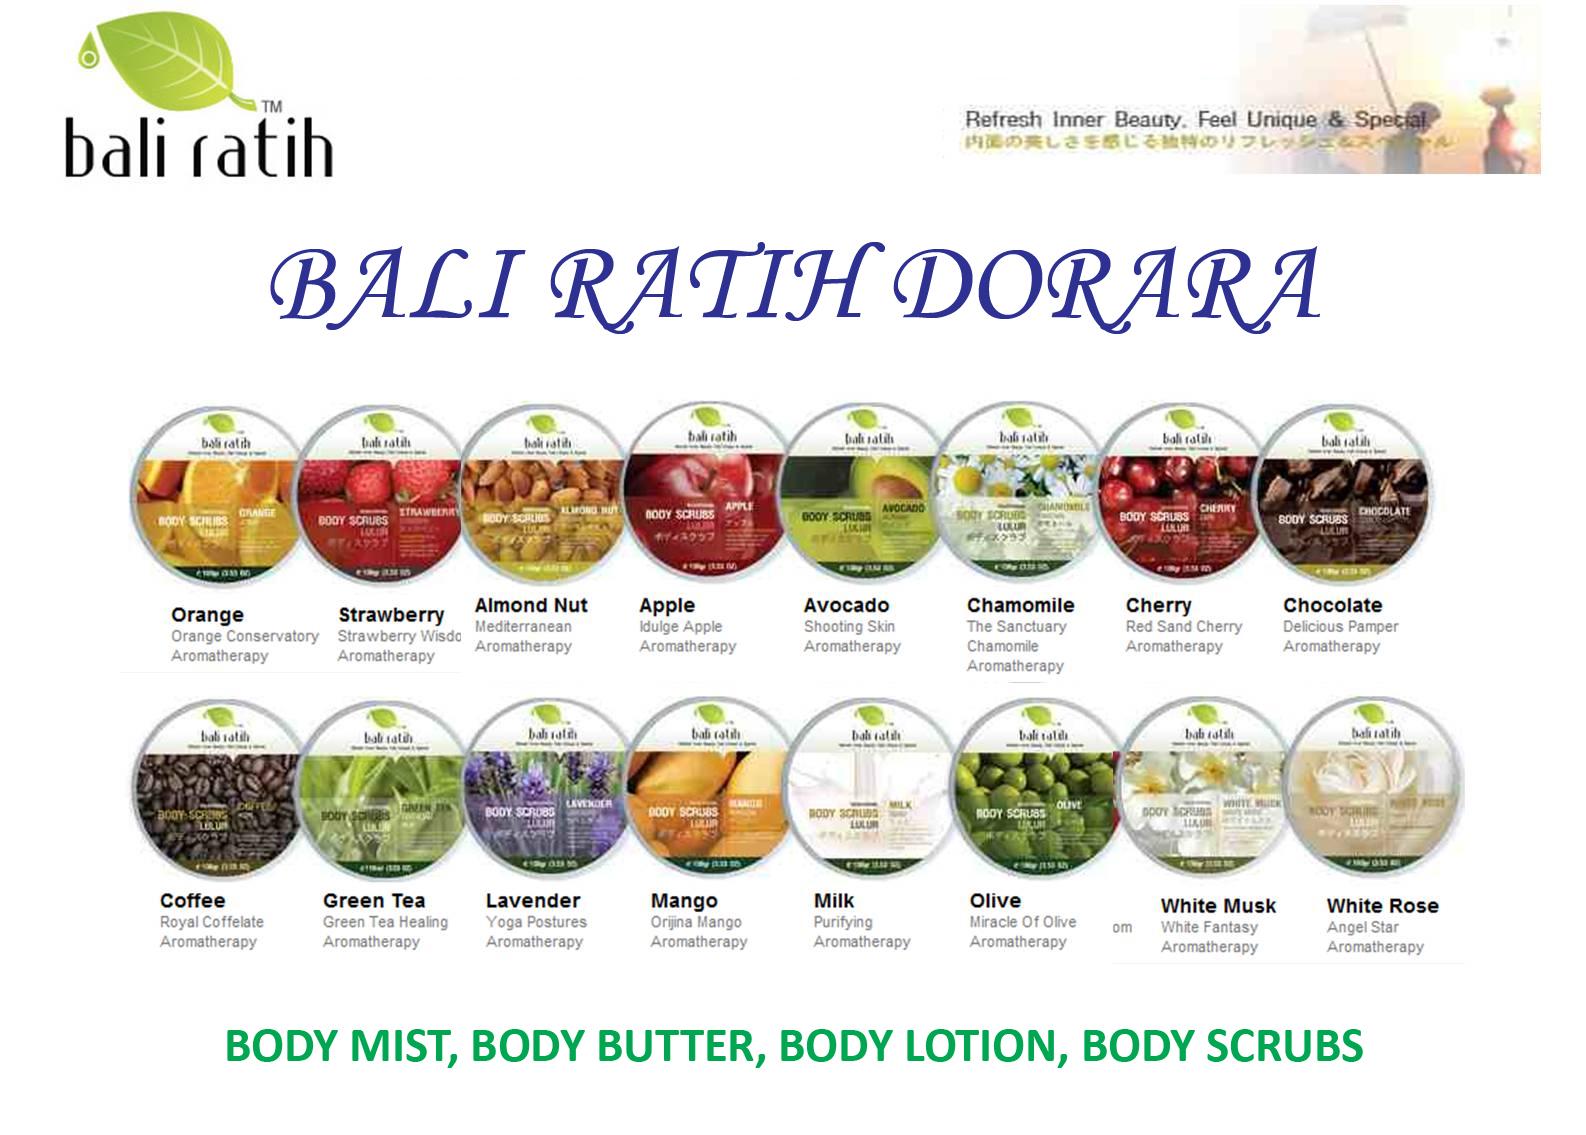 Bali Ratih Dorara Body Lotion 16 Variant Aromatherapy Ratihdorara Almond Nut Apple Avocado Chamommile Cherry Chocolate Coffee Green Tea Lavender Mango Milk Olive